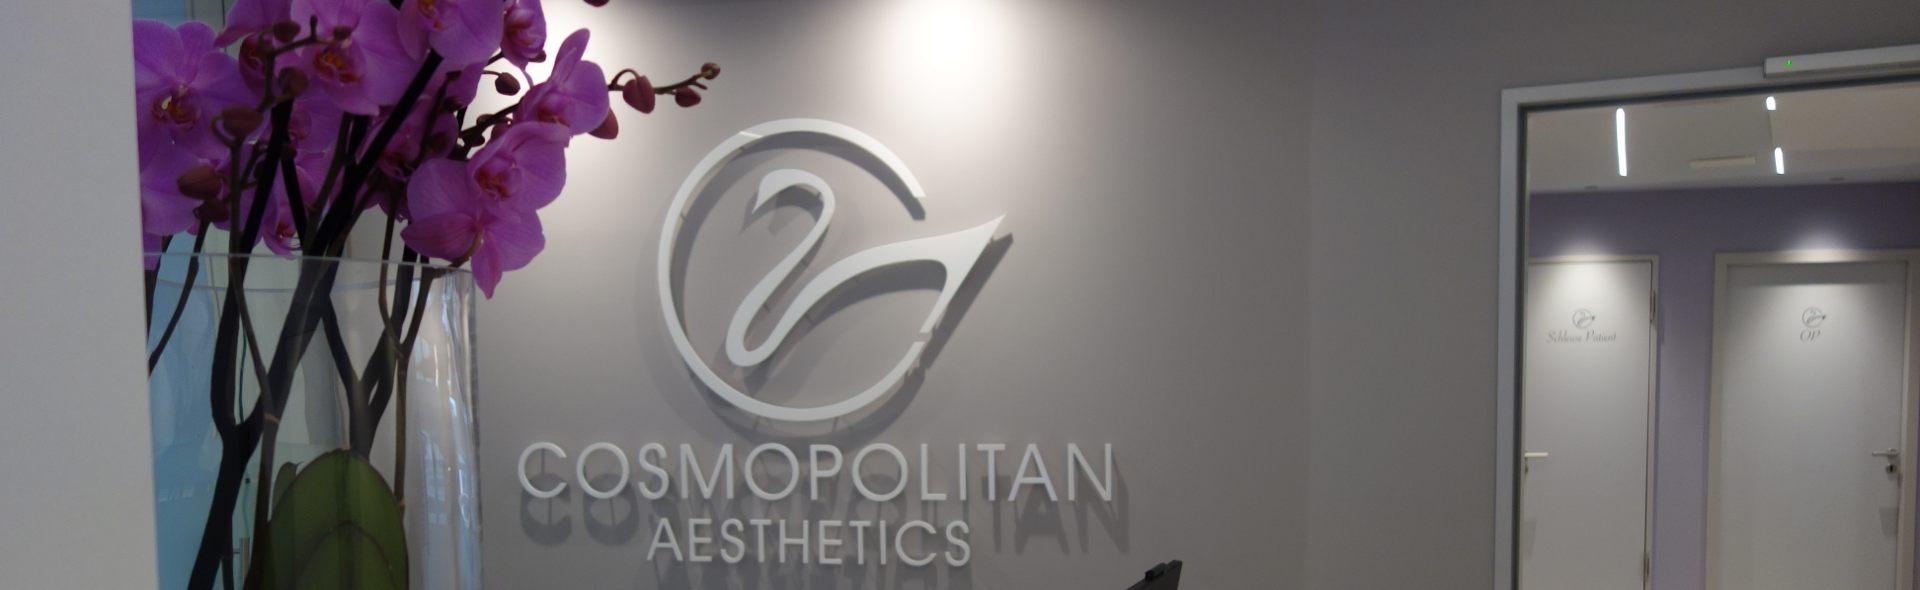 Cosmopolitan Aesthetics